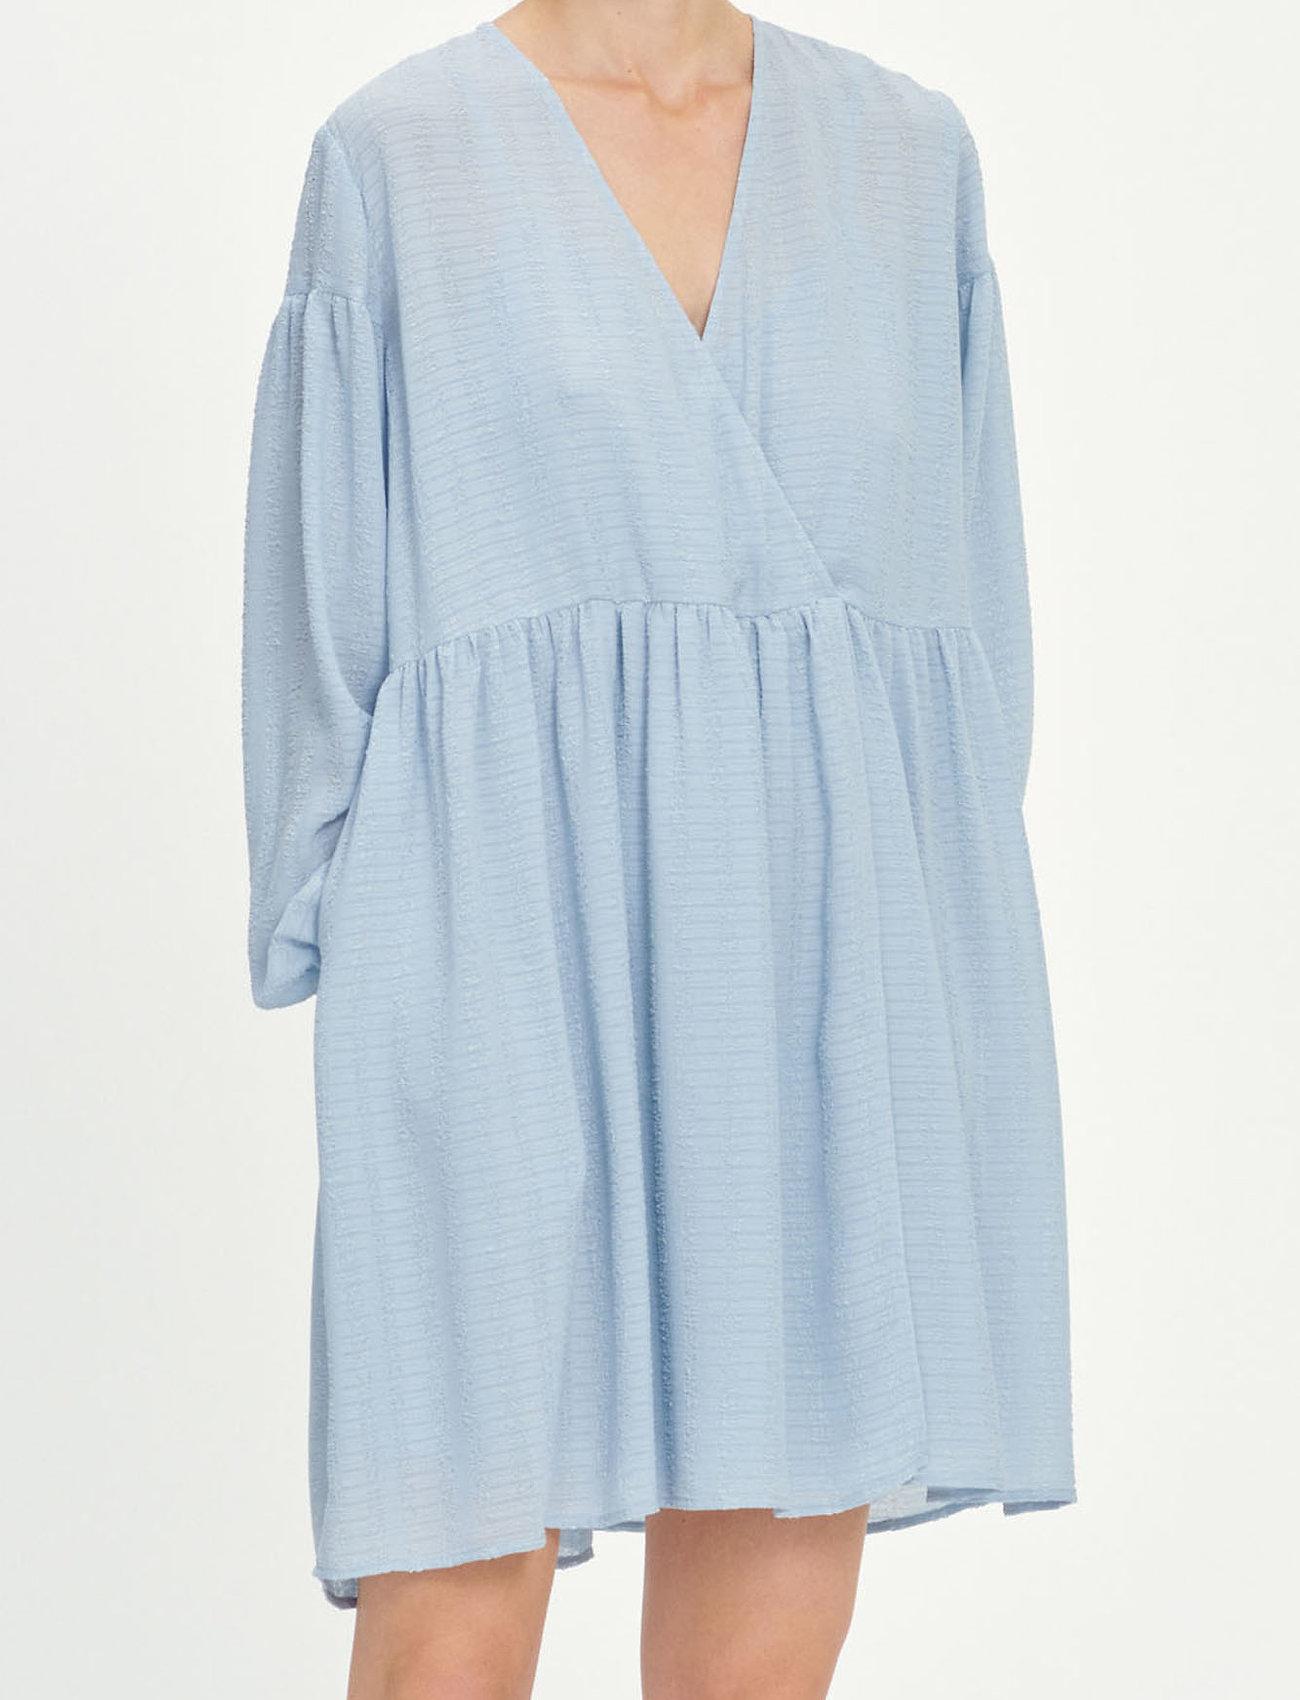 Samsøe Samsøe - Jolie short dress 12697 - summer dresses - dusty blue - 0